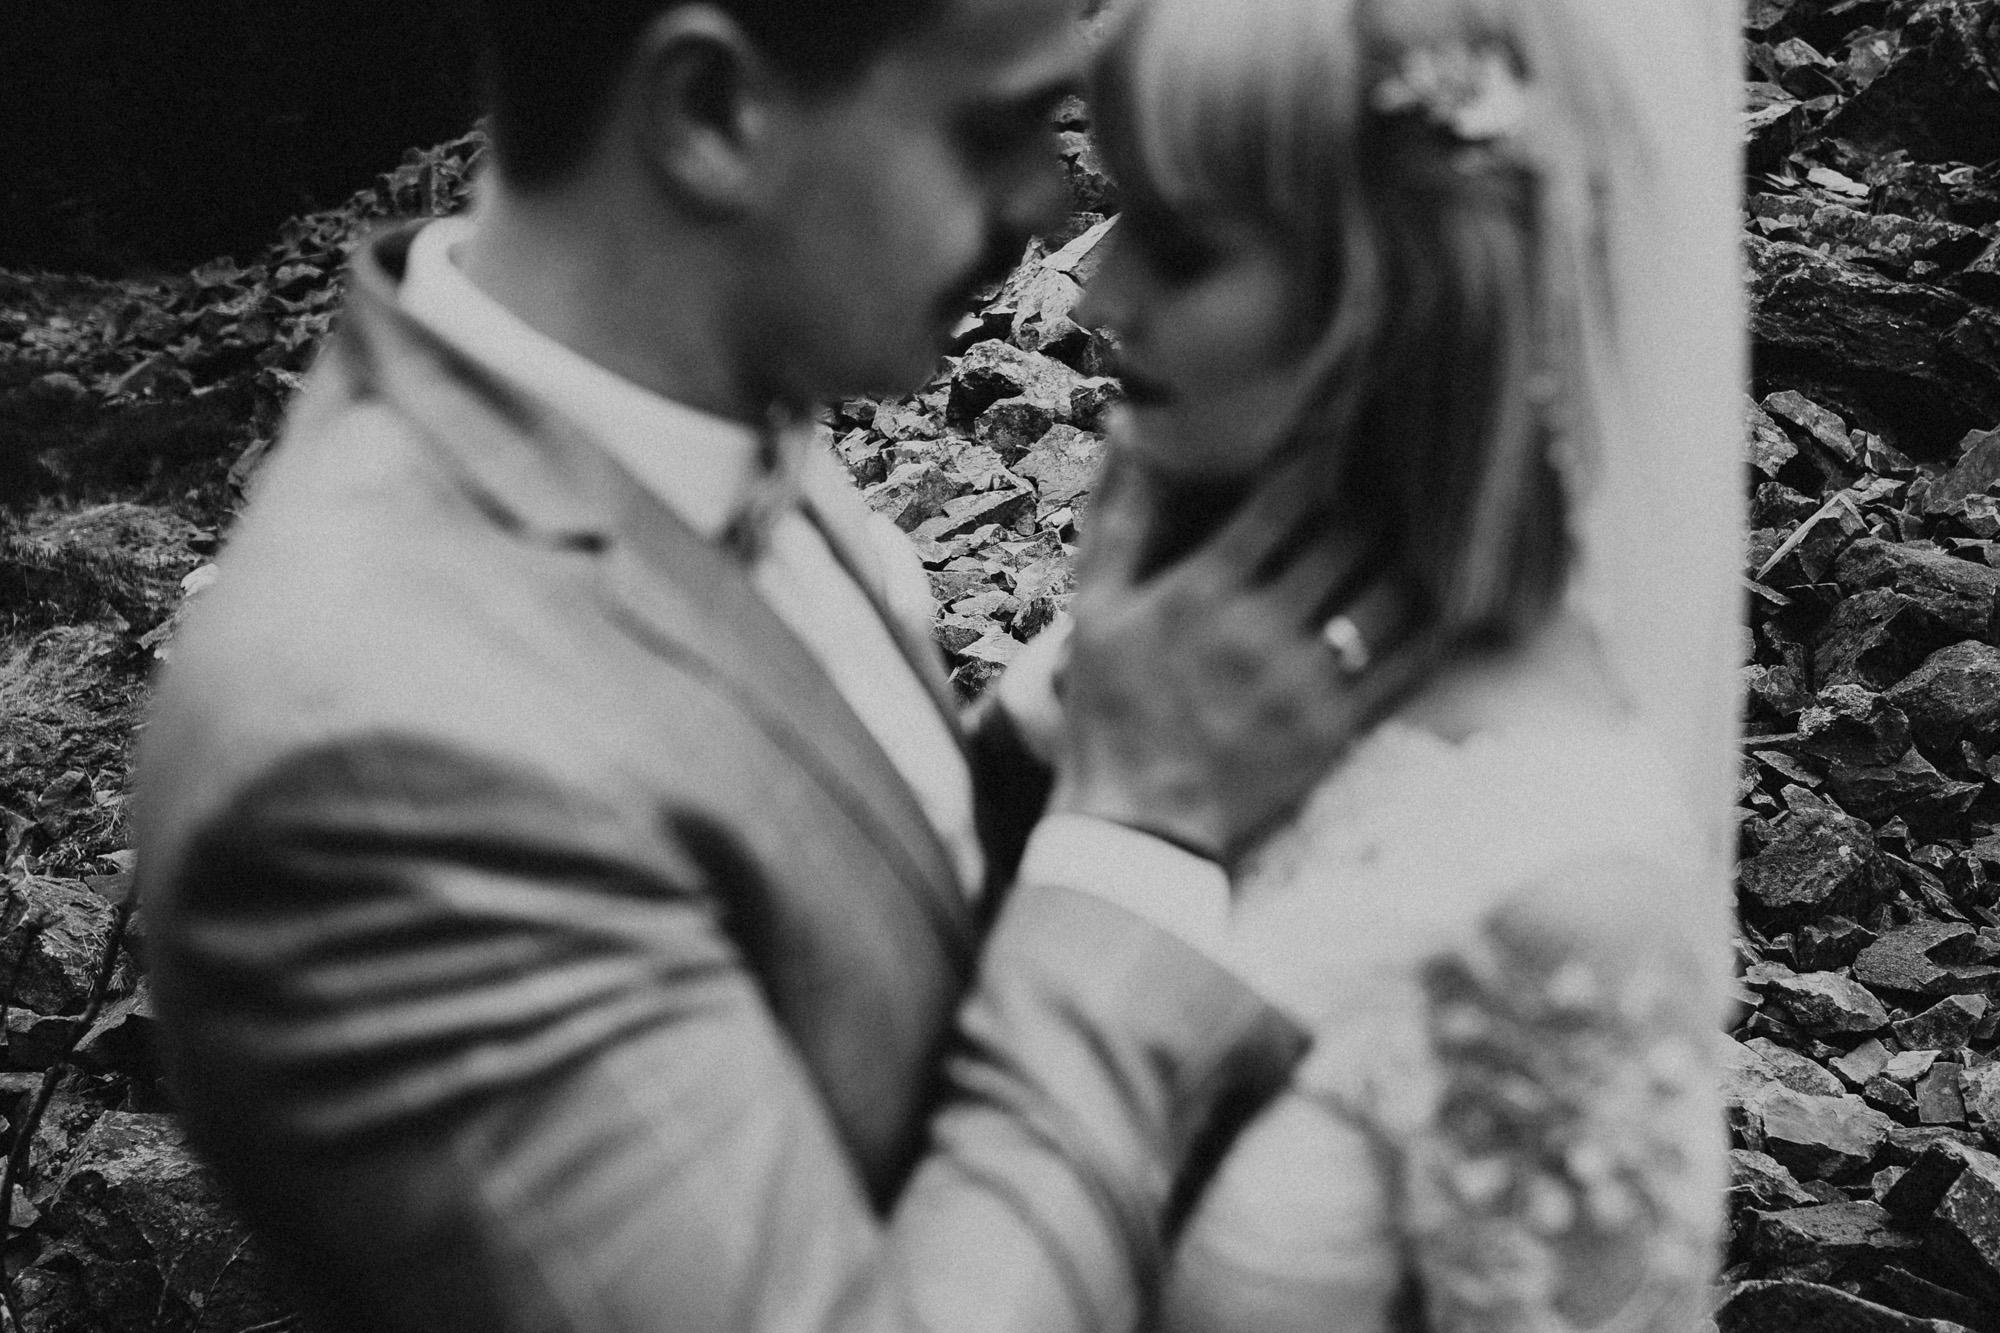 DanielaMarquardtPhotography_Hochzeitsfotograf_Düsseldorf_Köln_Mallorca_Bayern_Austria_Harz_LinaundMaik_Afterwedding-Shooting_Weddingphotographer_Ibiza_Tuskany_Italien_Toskana95